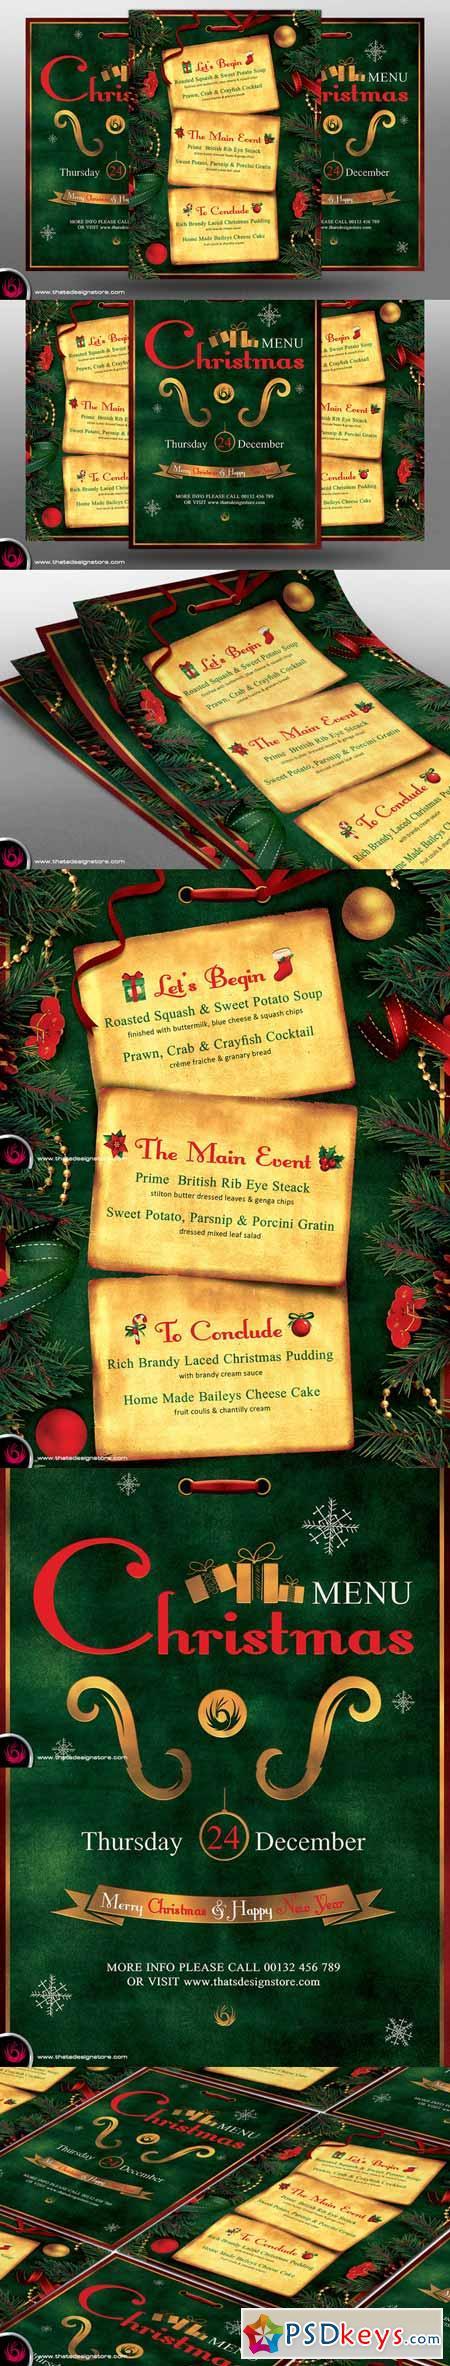 christmas menu template v photoshop vector christmas menu template v2 392586